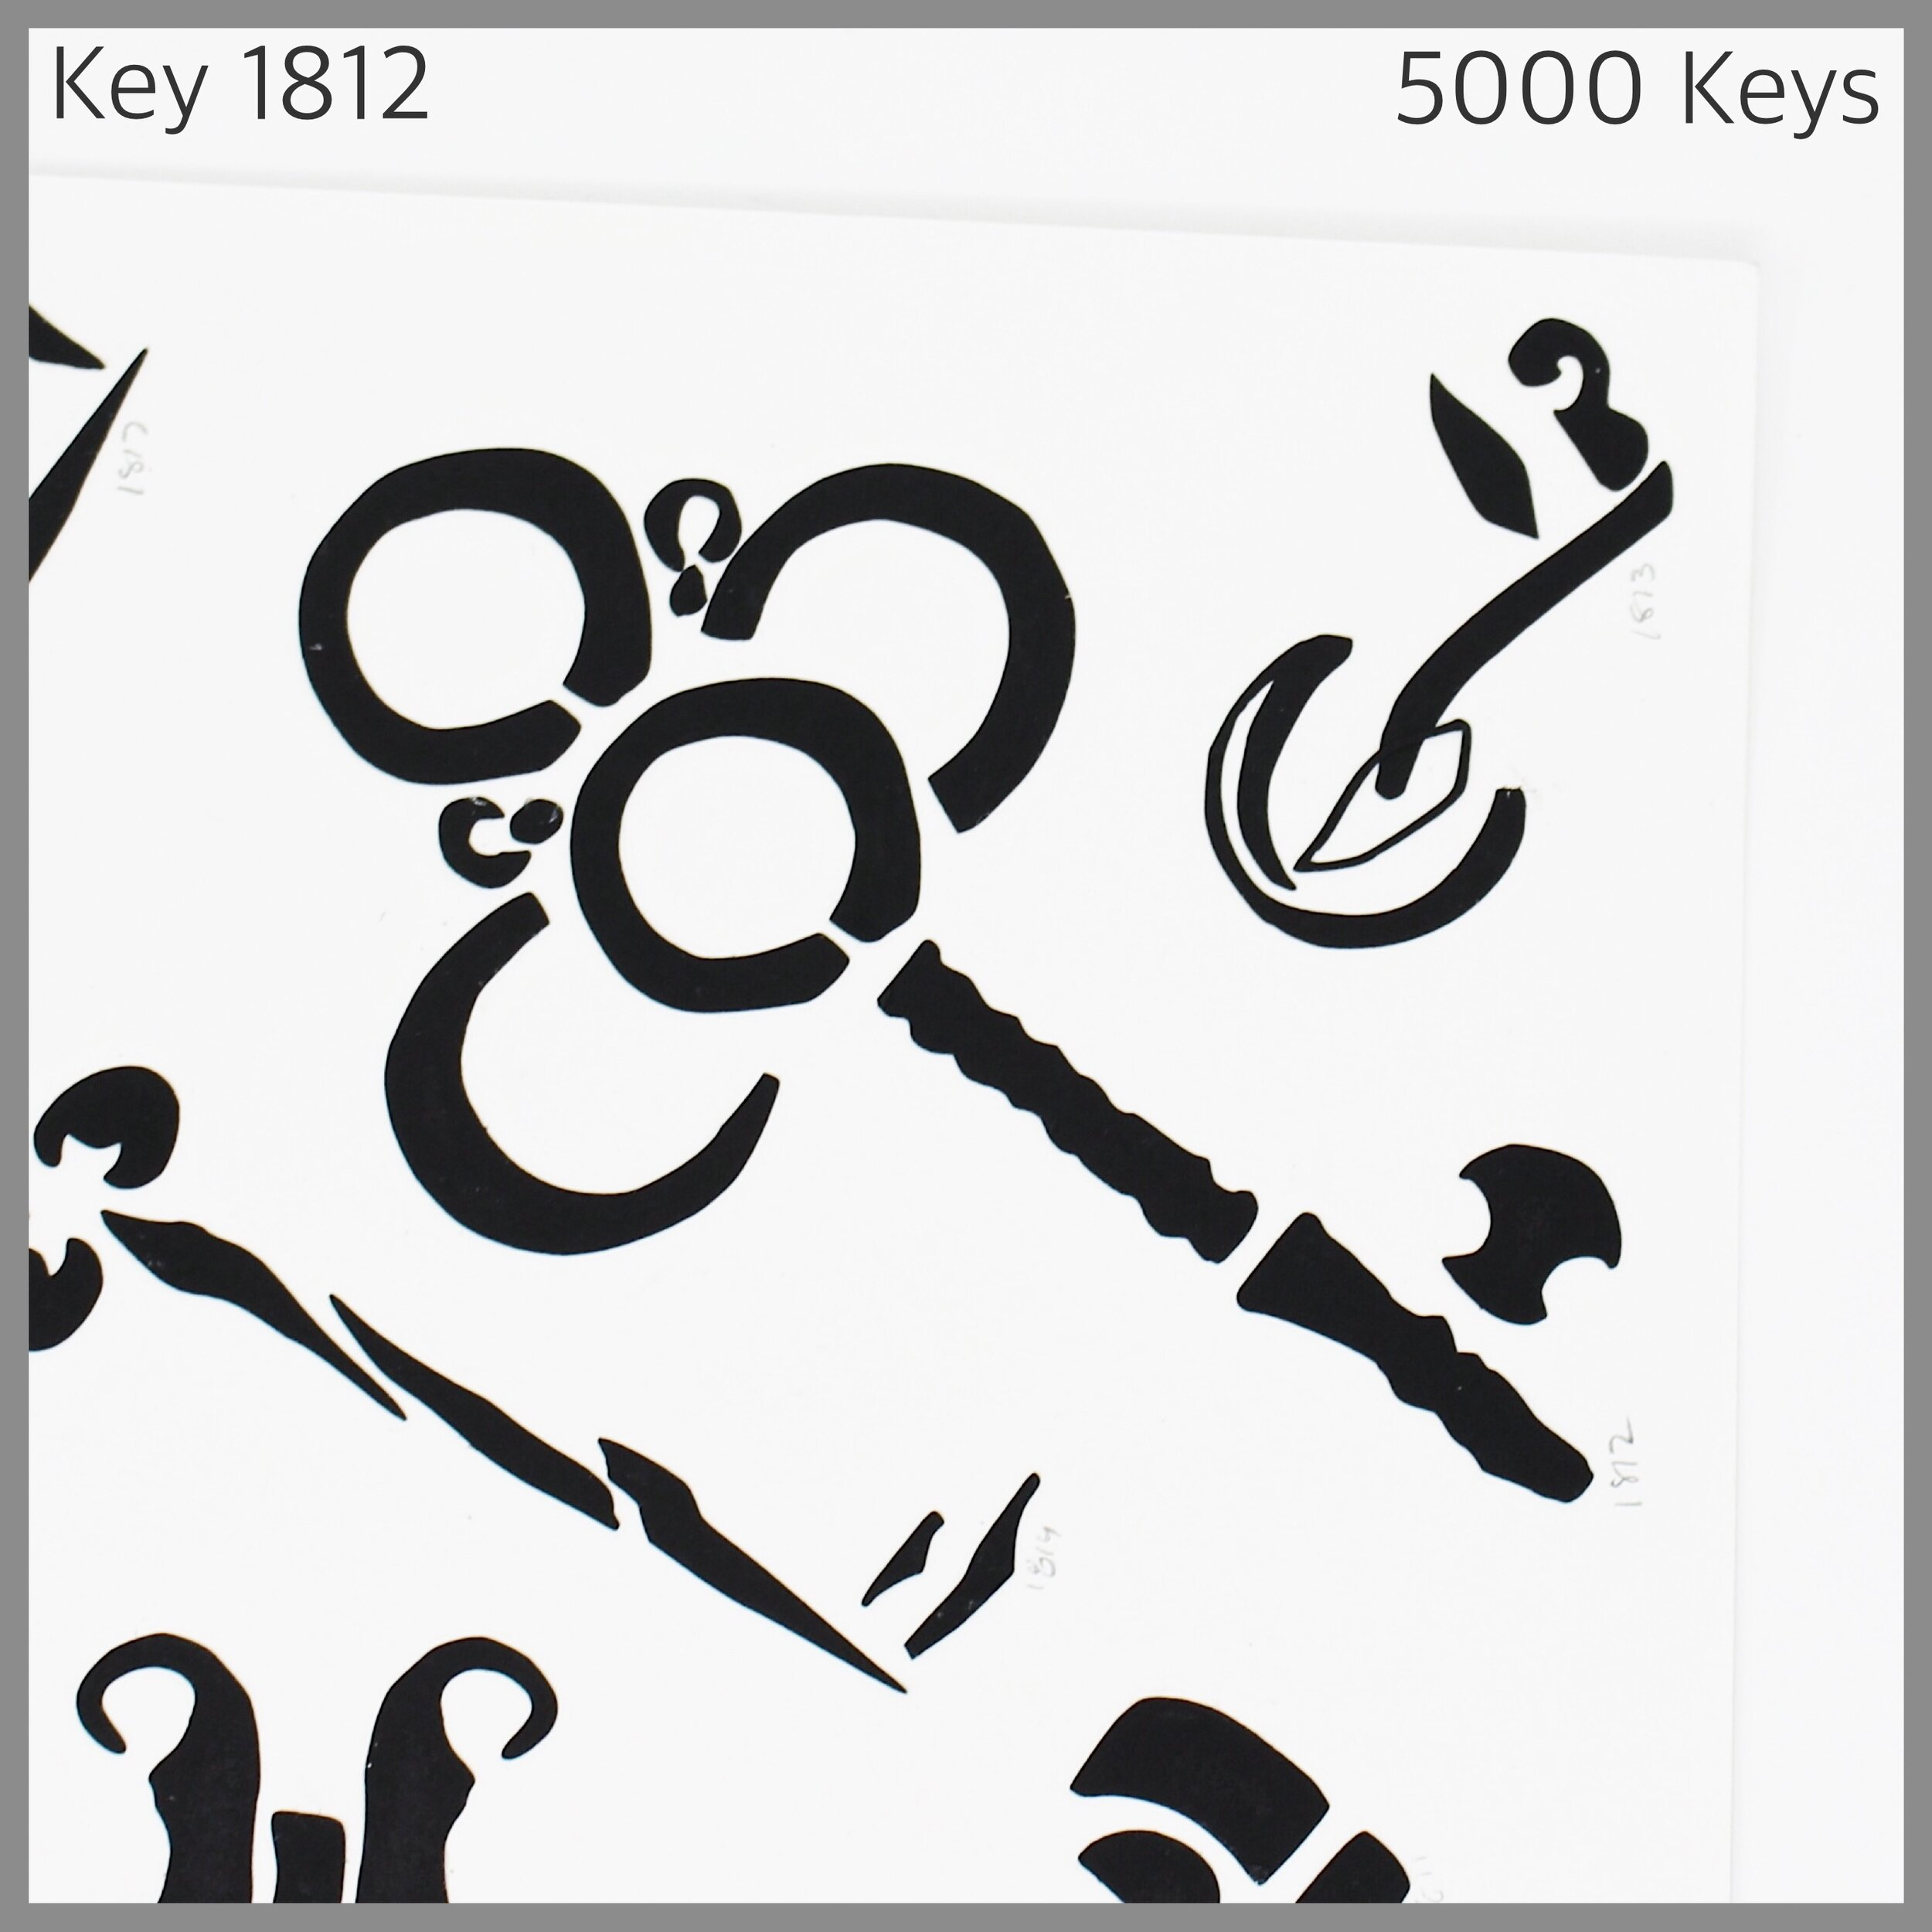 Key 1812 - 1.JPG